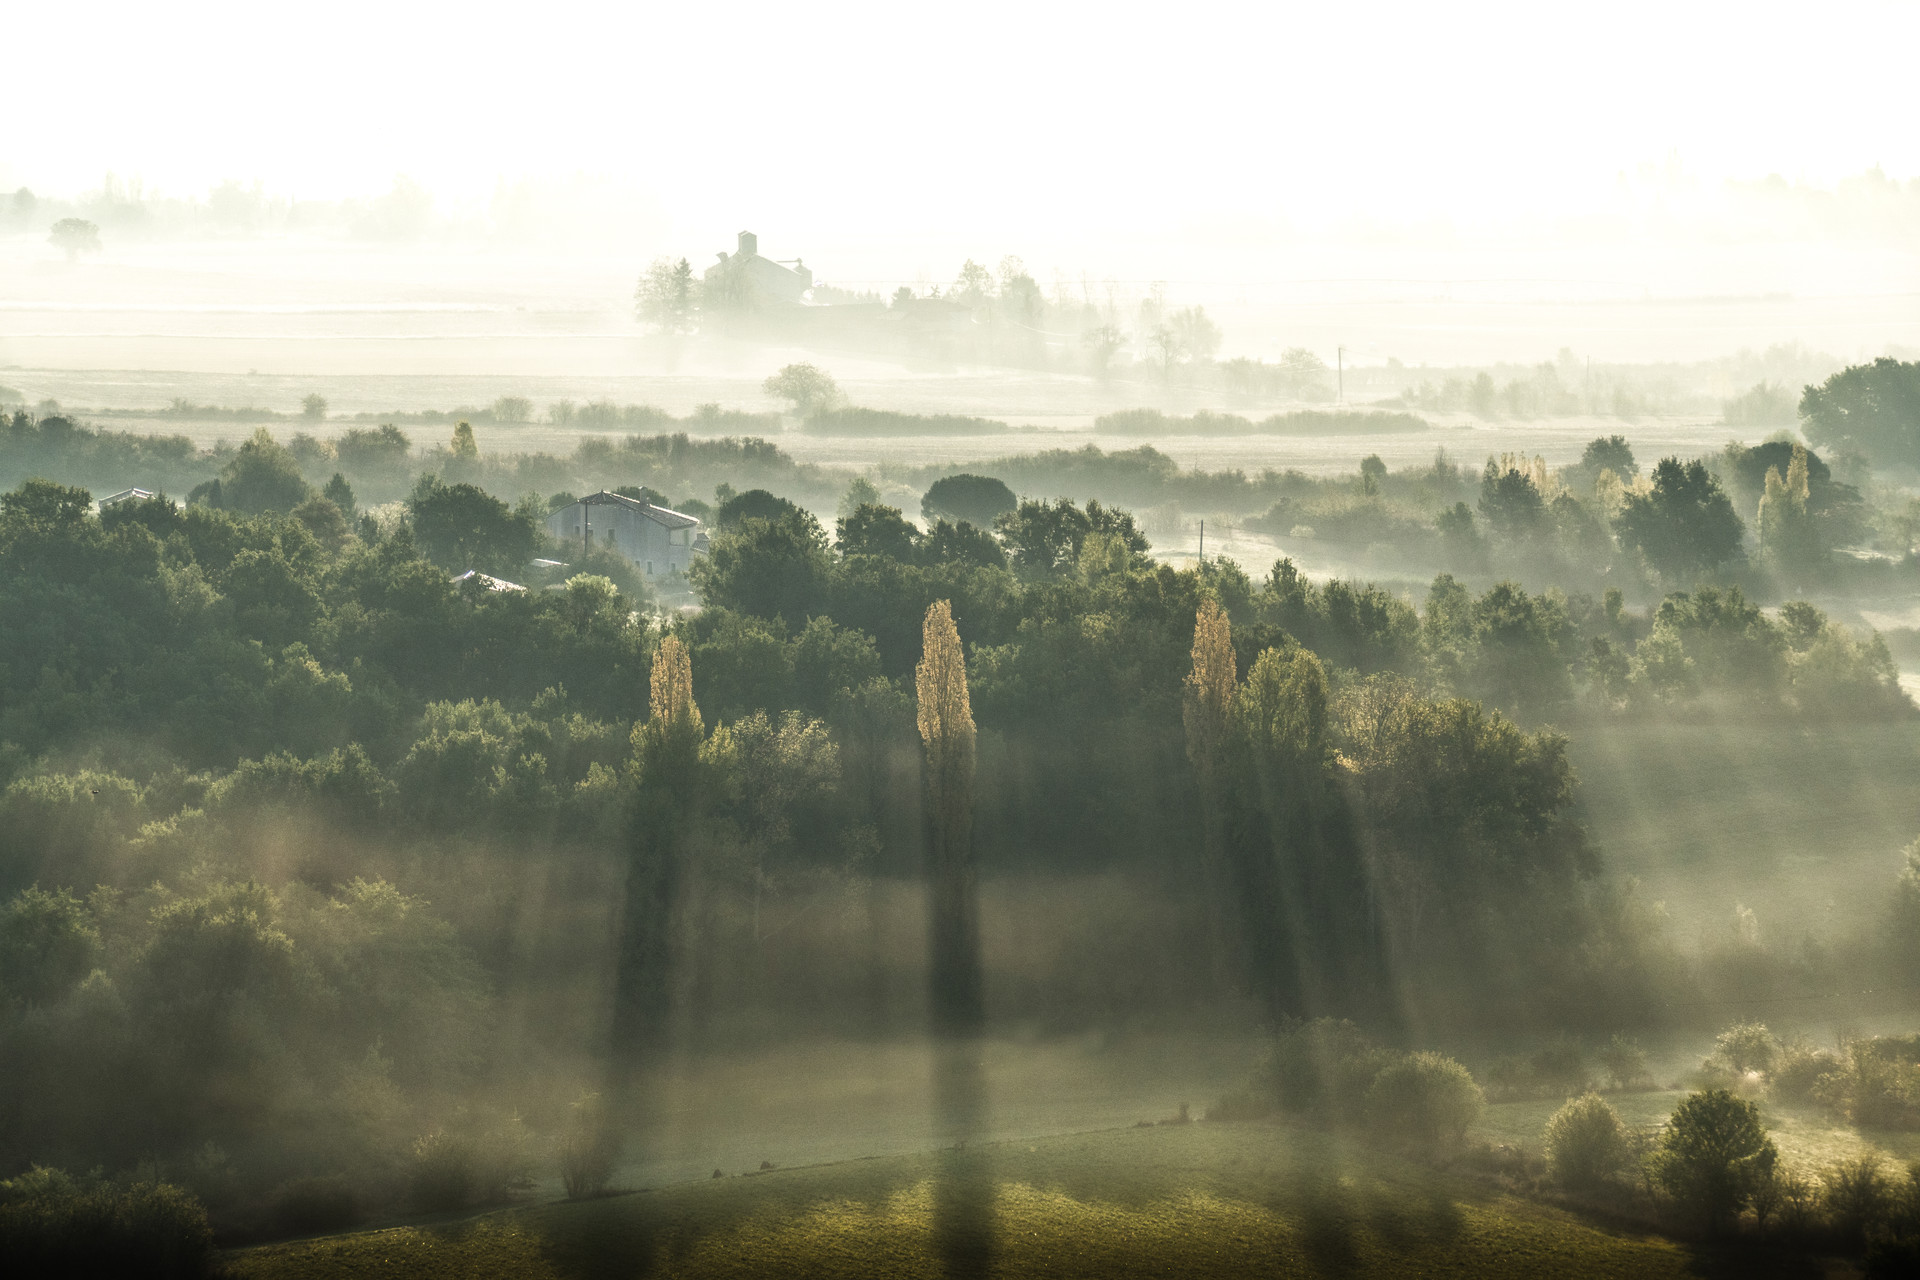 Brume matinale, Tarn, France